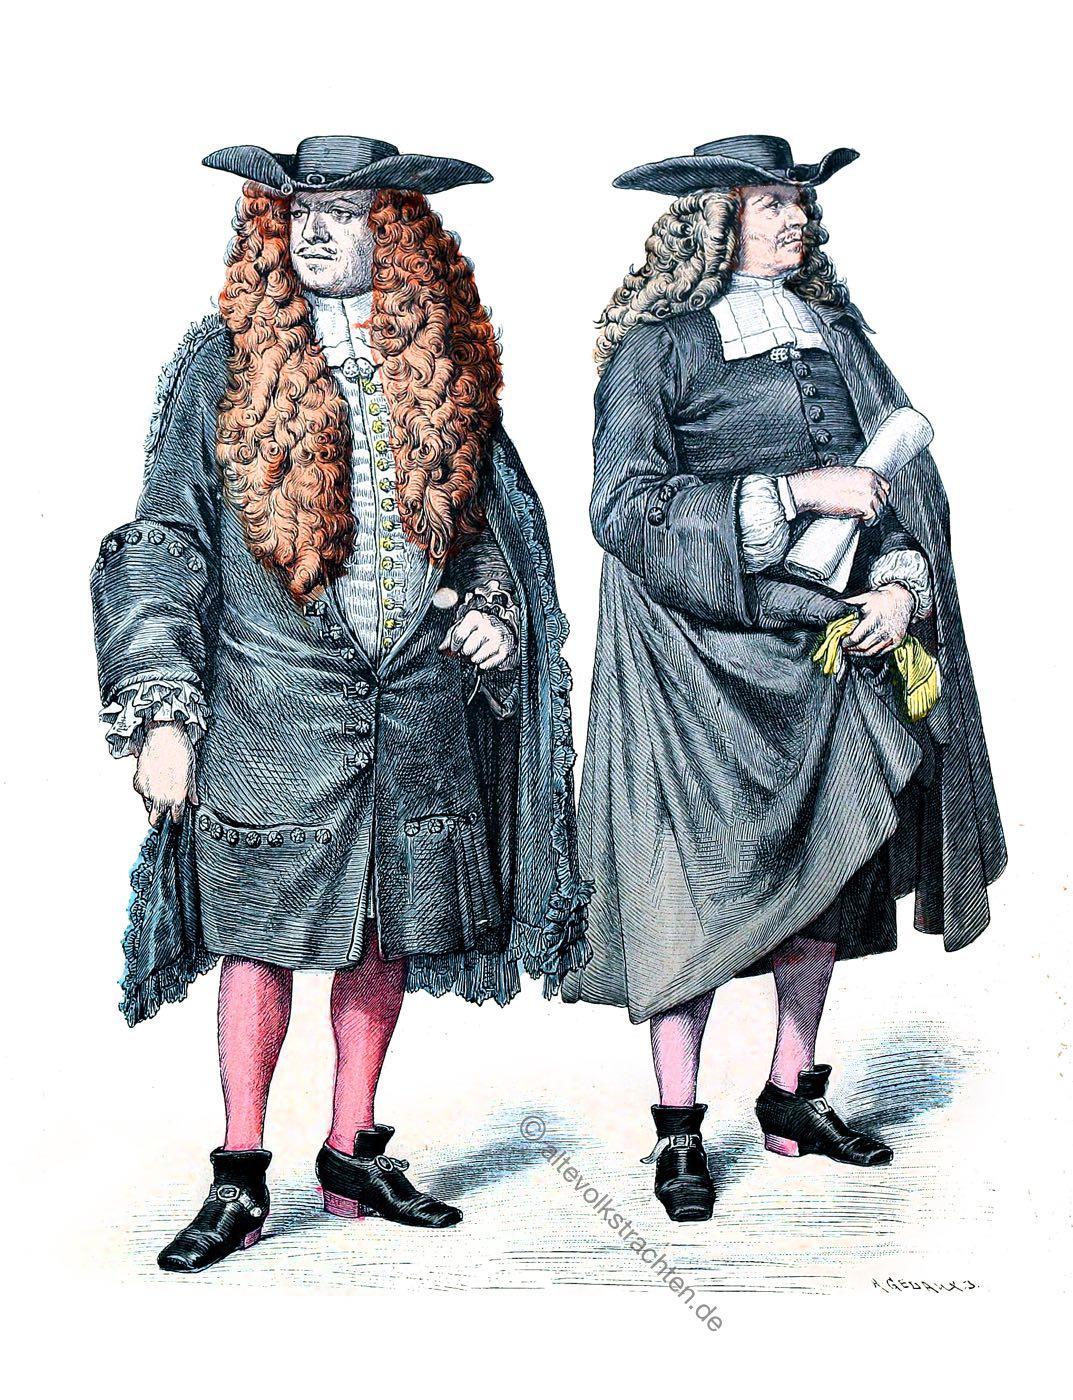 Münchener Bilderbogen, Mode, Barock, Strassburg, Kostüme, Ratsherr, Consul, Allongeperücken